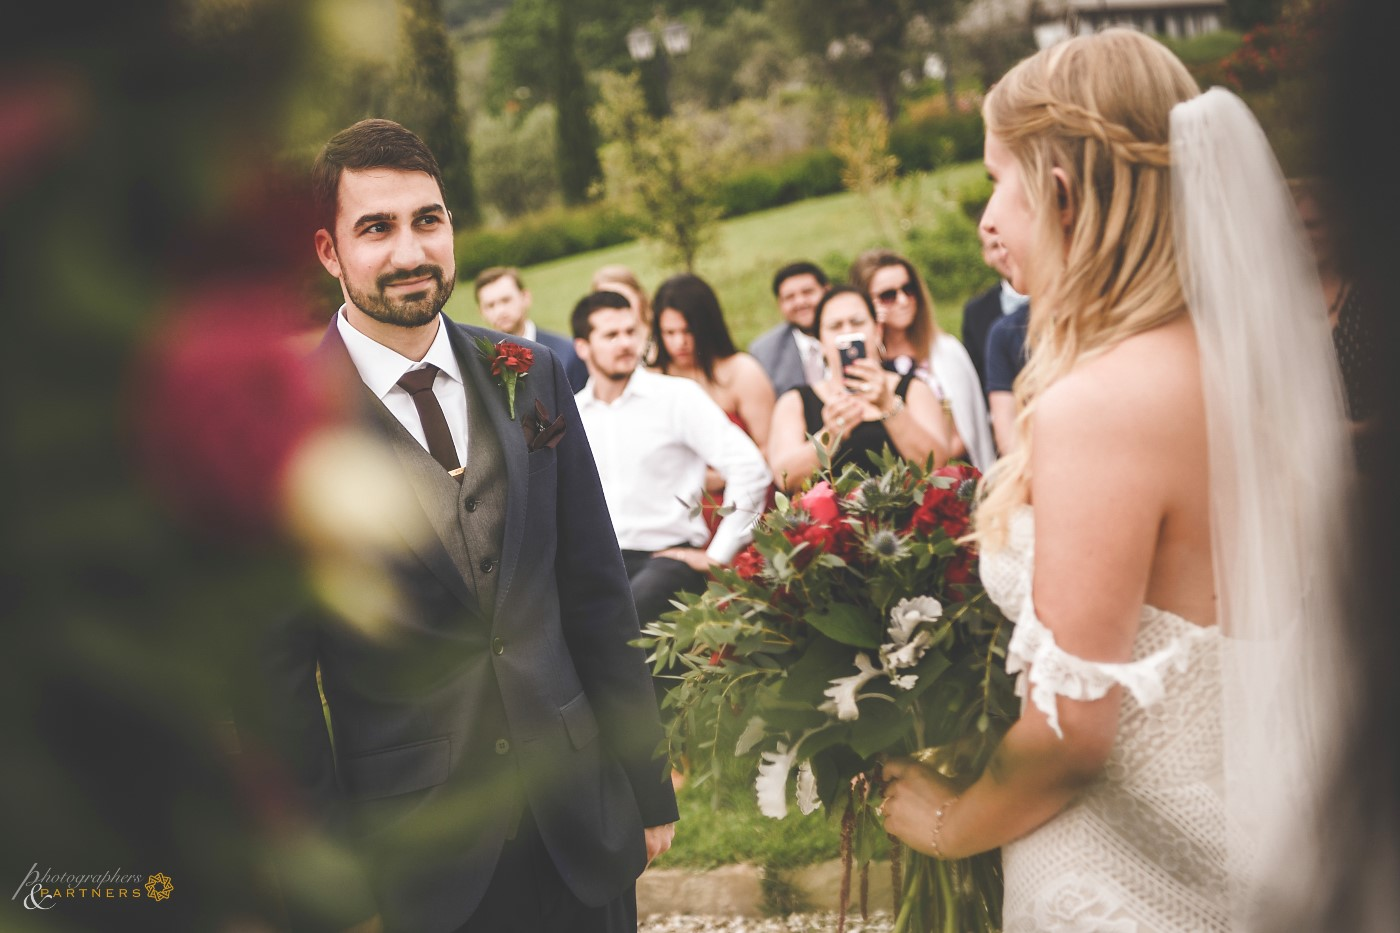 photographers_weddings_italy_07.jpg